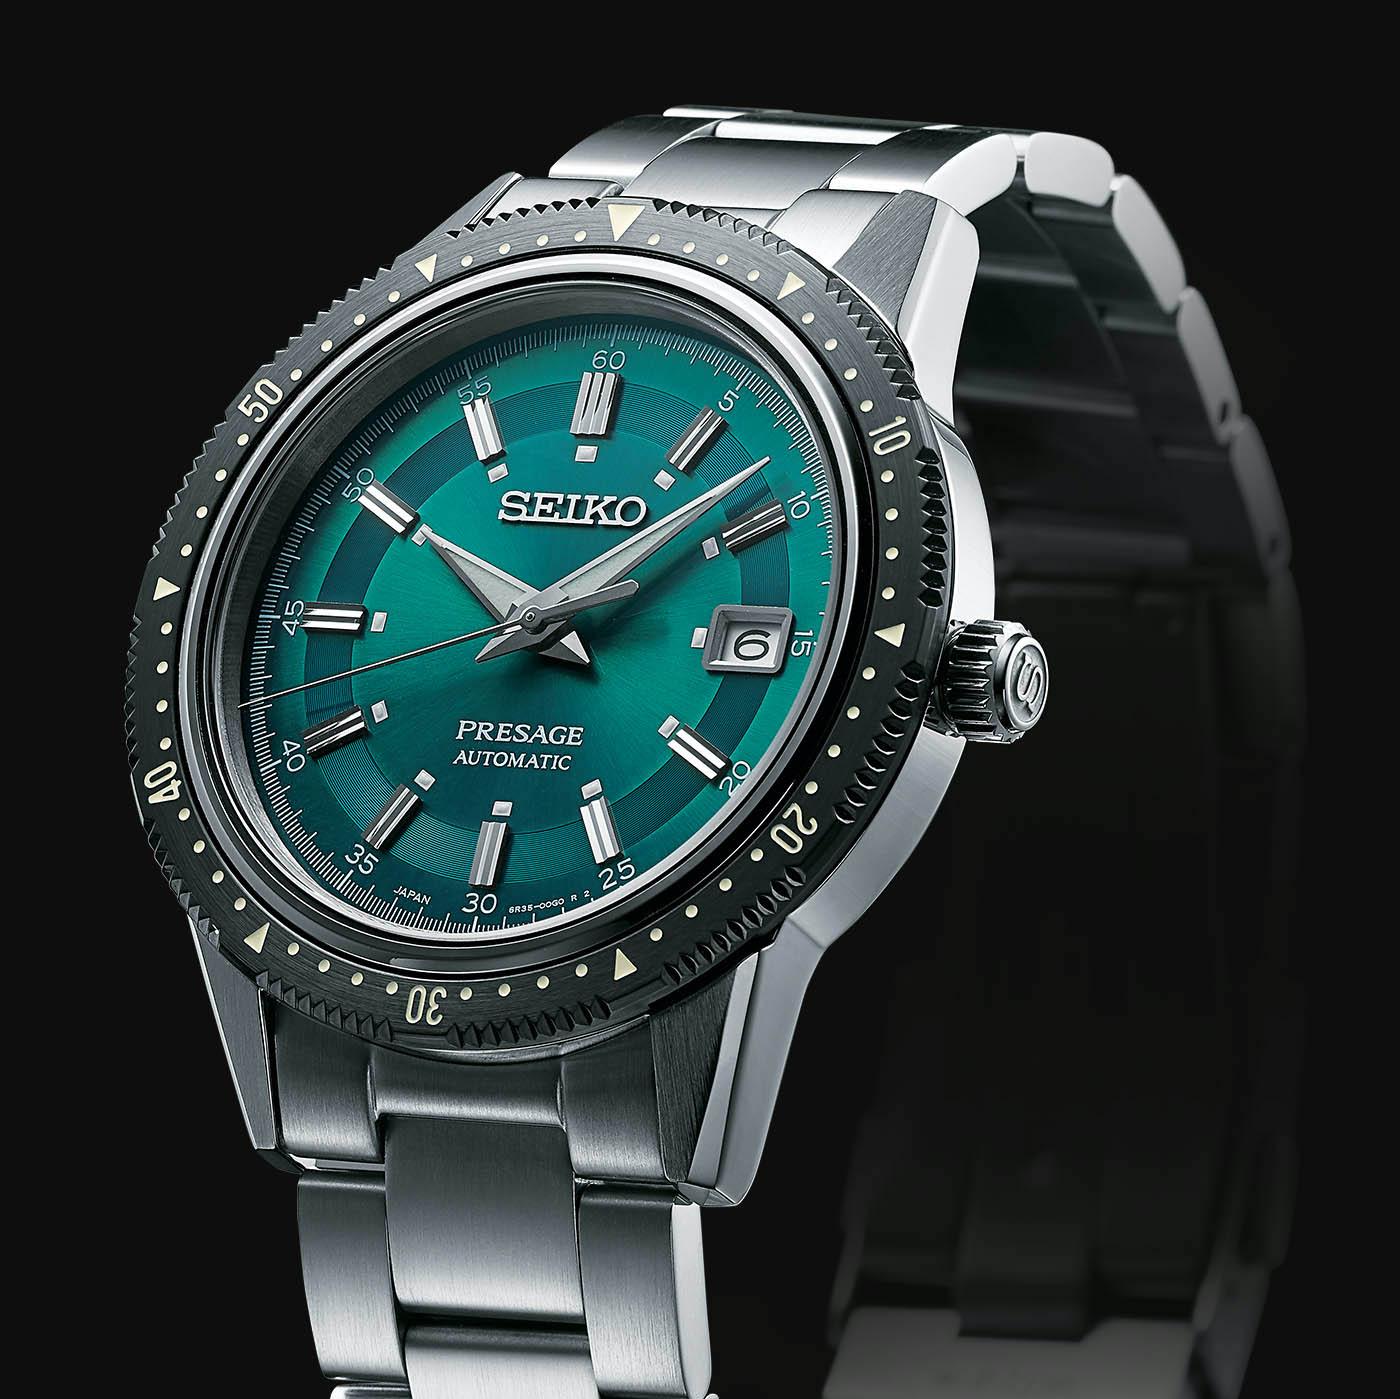 Seiko's new Presage 2020 Limited Edition Seiko-Presage-2020-Limited-Edition-SPB129J1-Tribute-1964-Crown-Chronograph-5